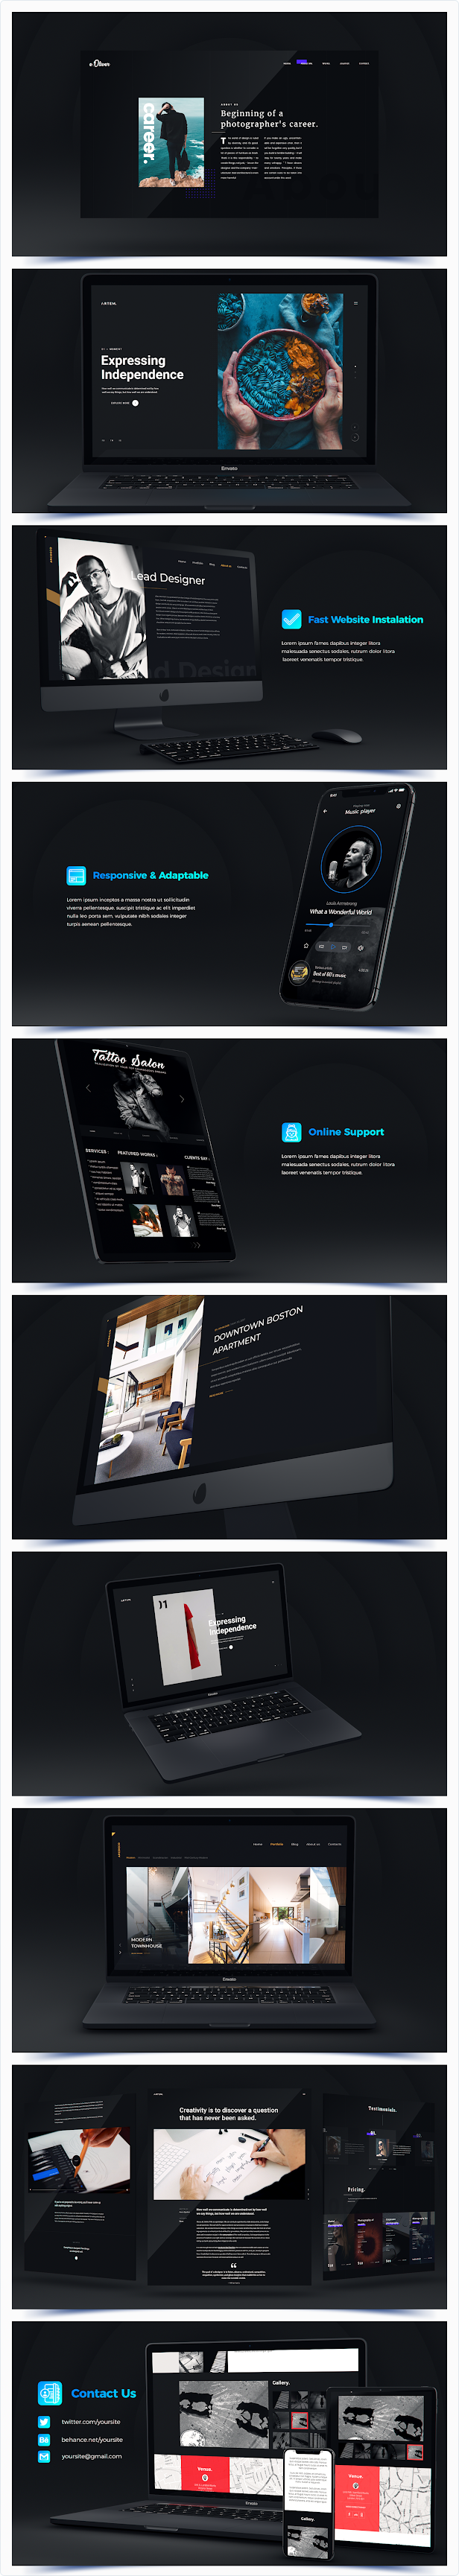 Website Presentation II - 5